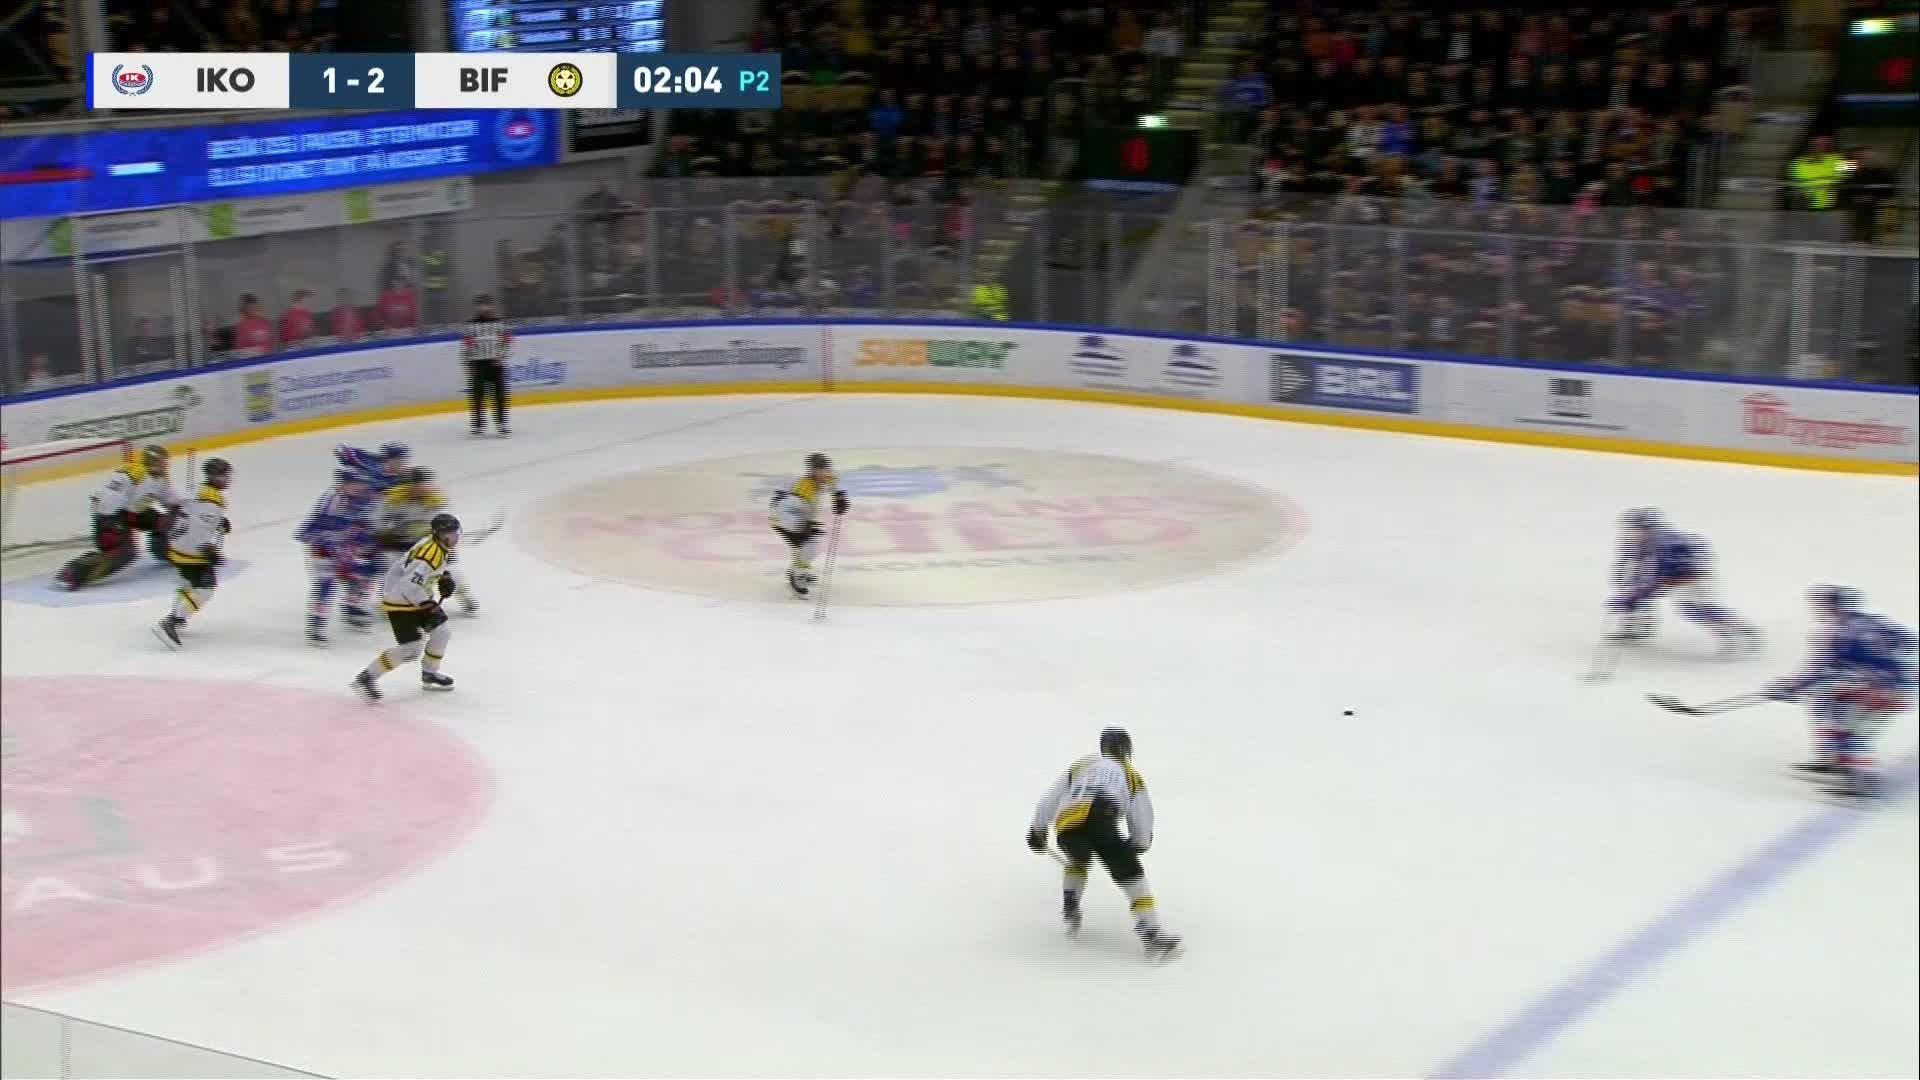 IK Oskarshamn - Brynäs IF 2-2